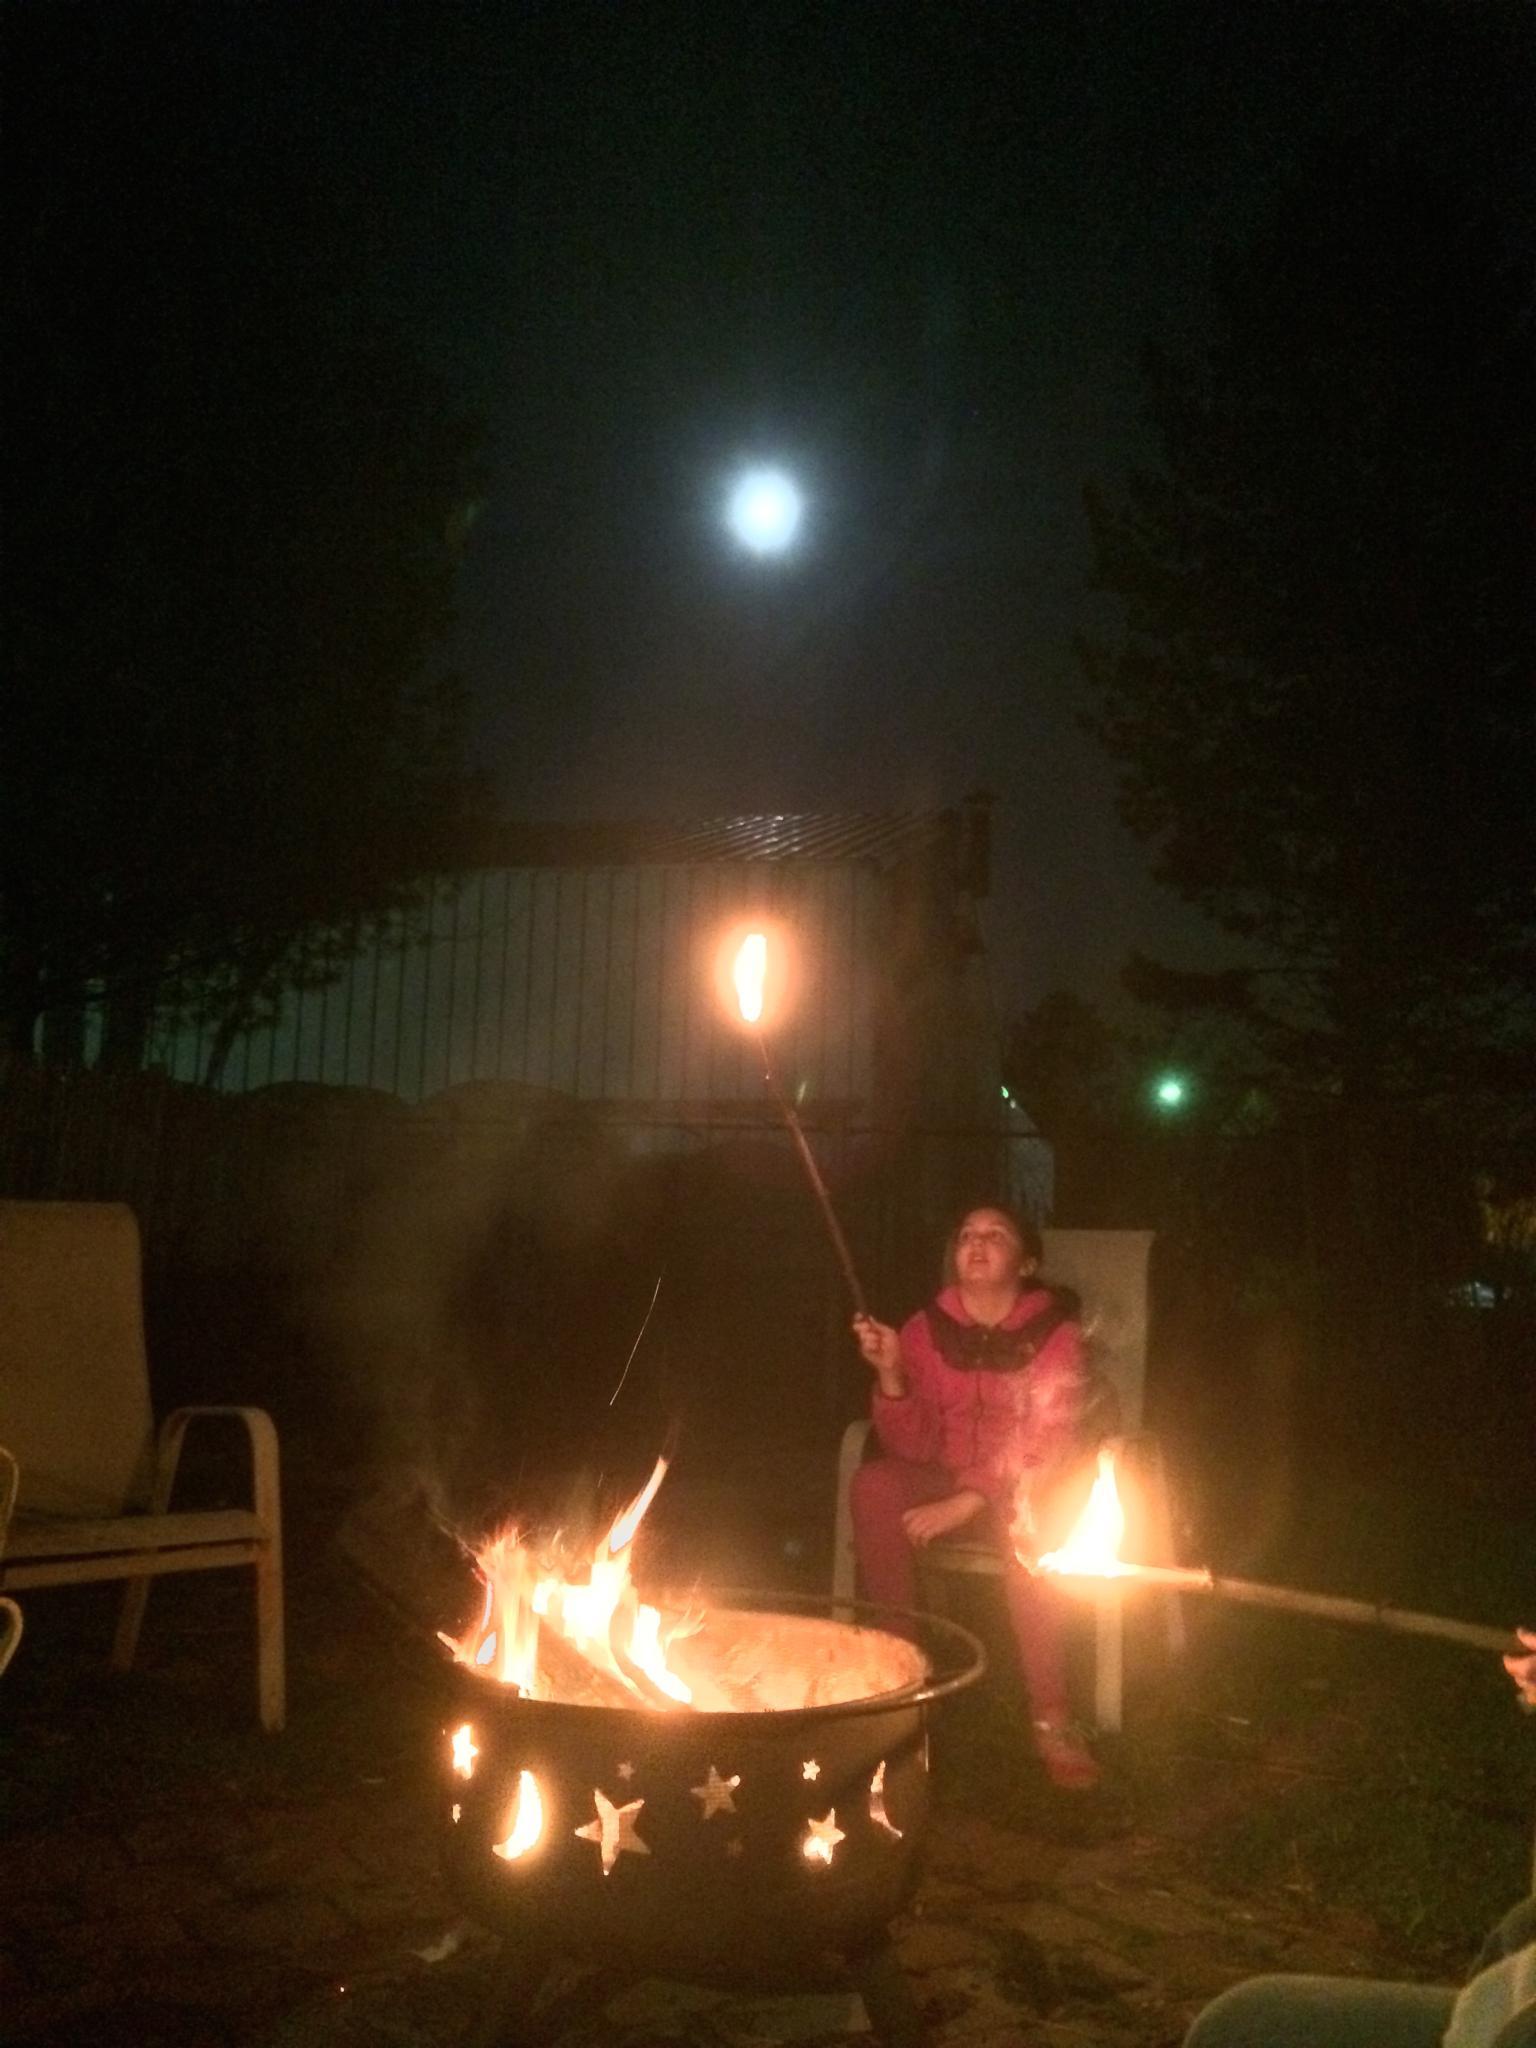 Full Moon;Wild Night by cathy.pepe.9